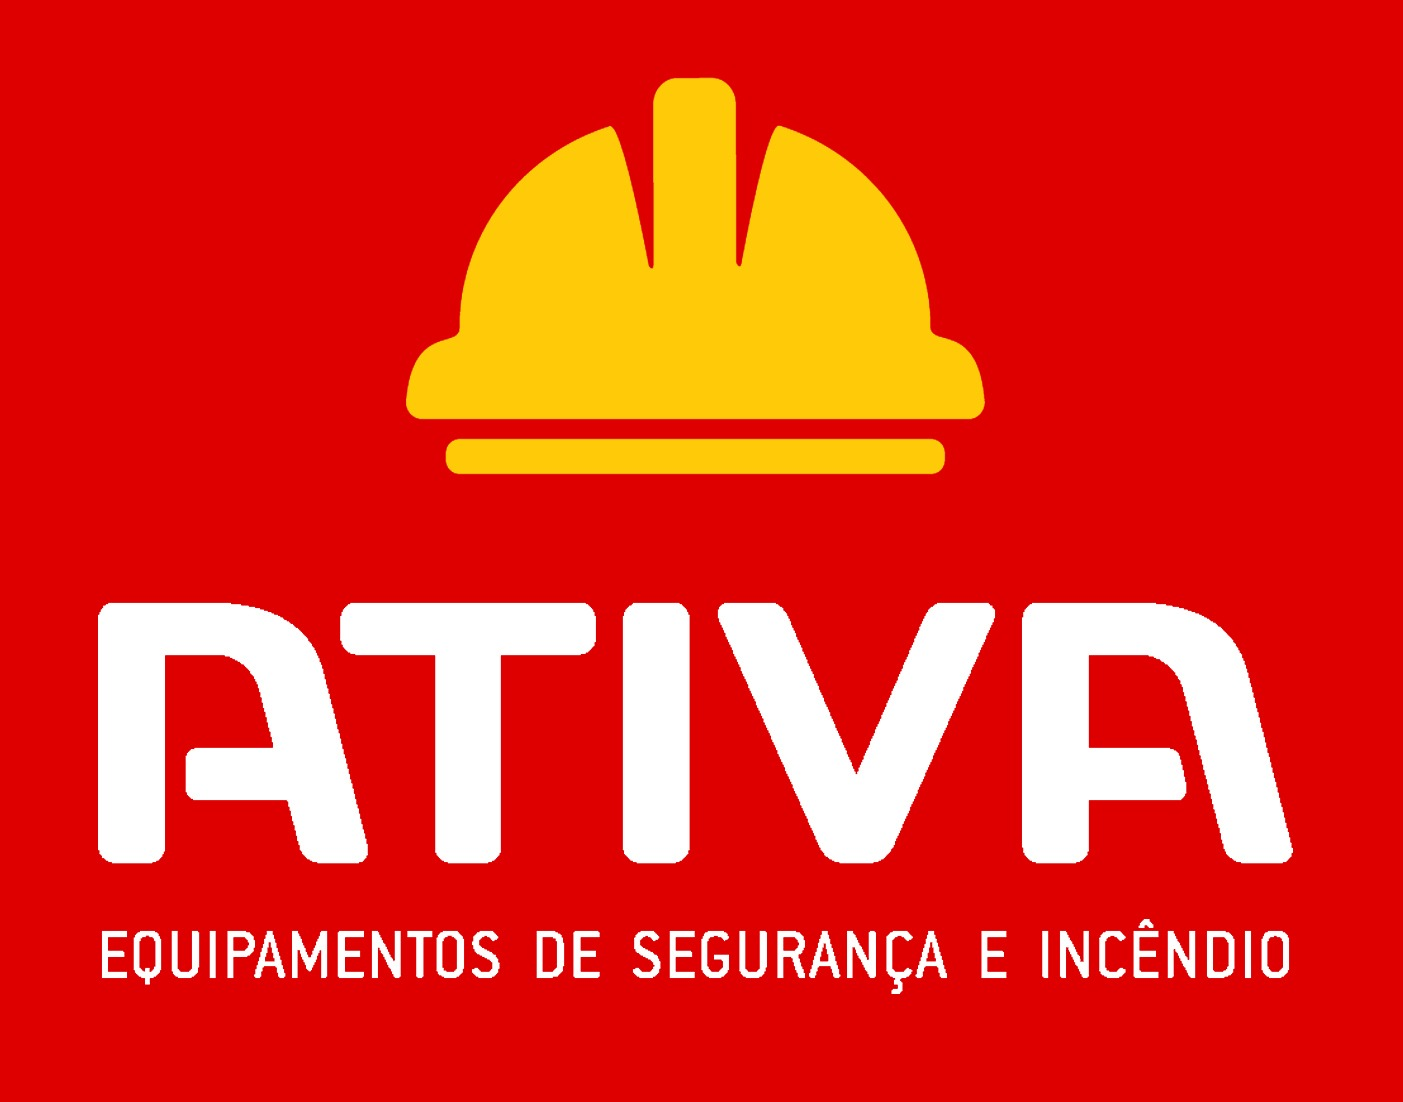 ATIVA EQUIPAMENTOS